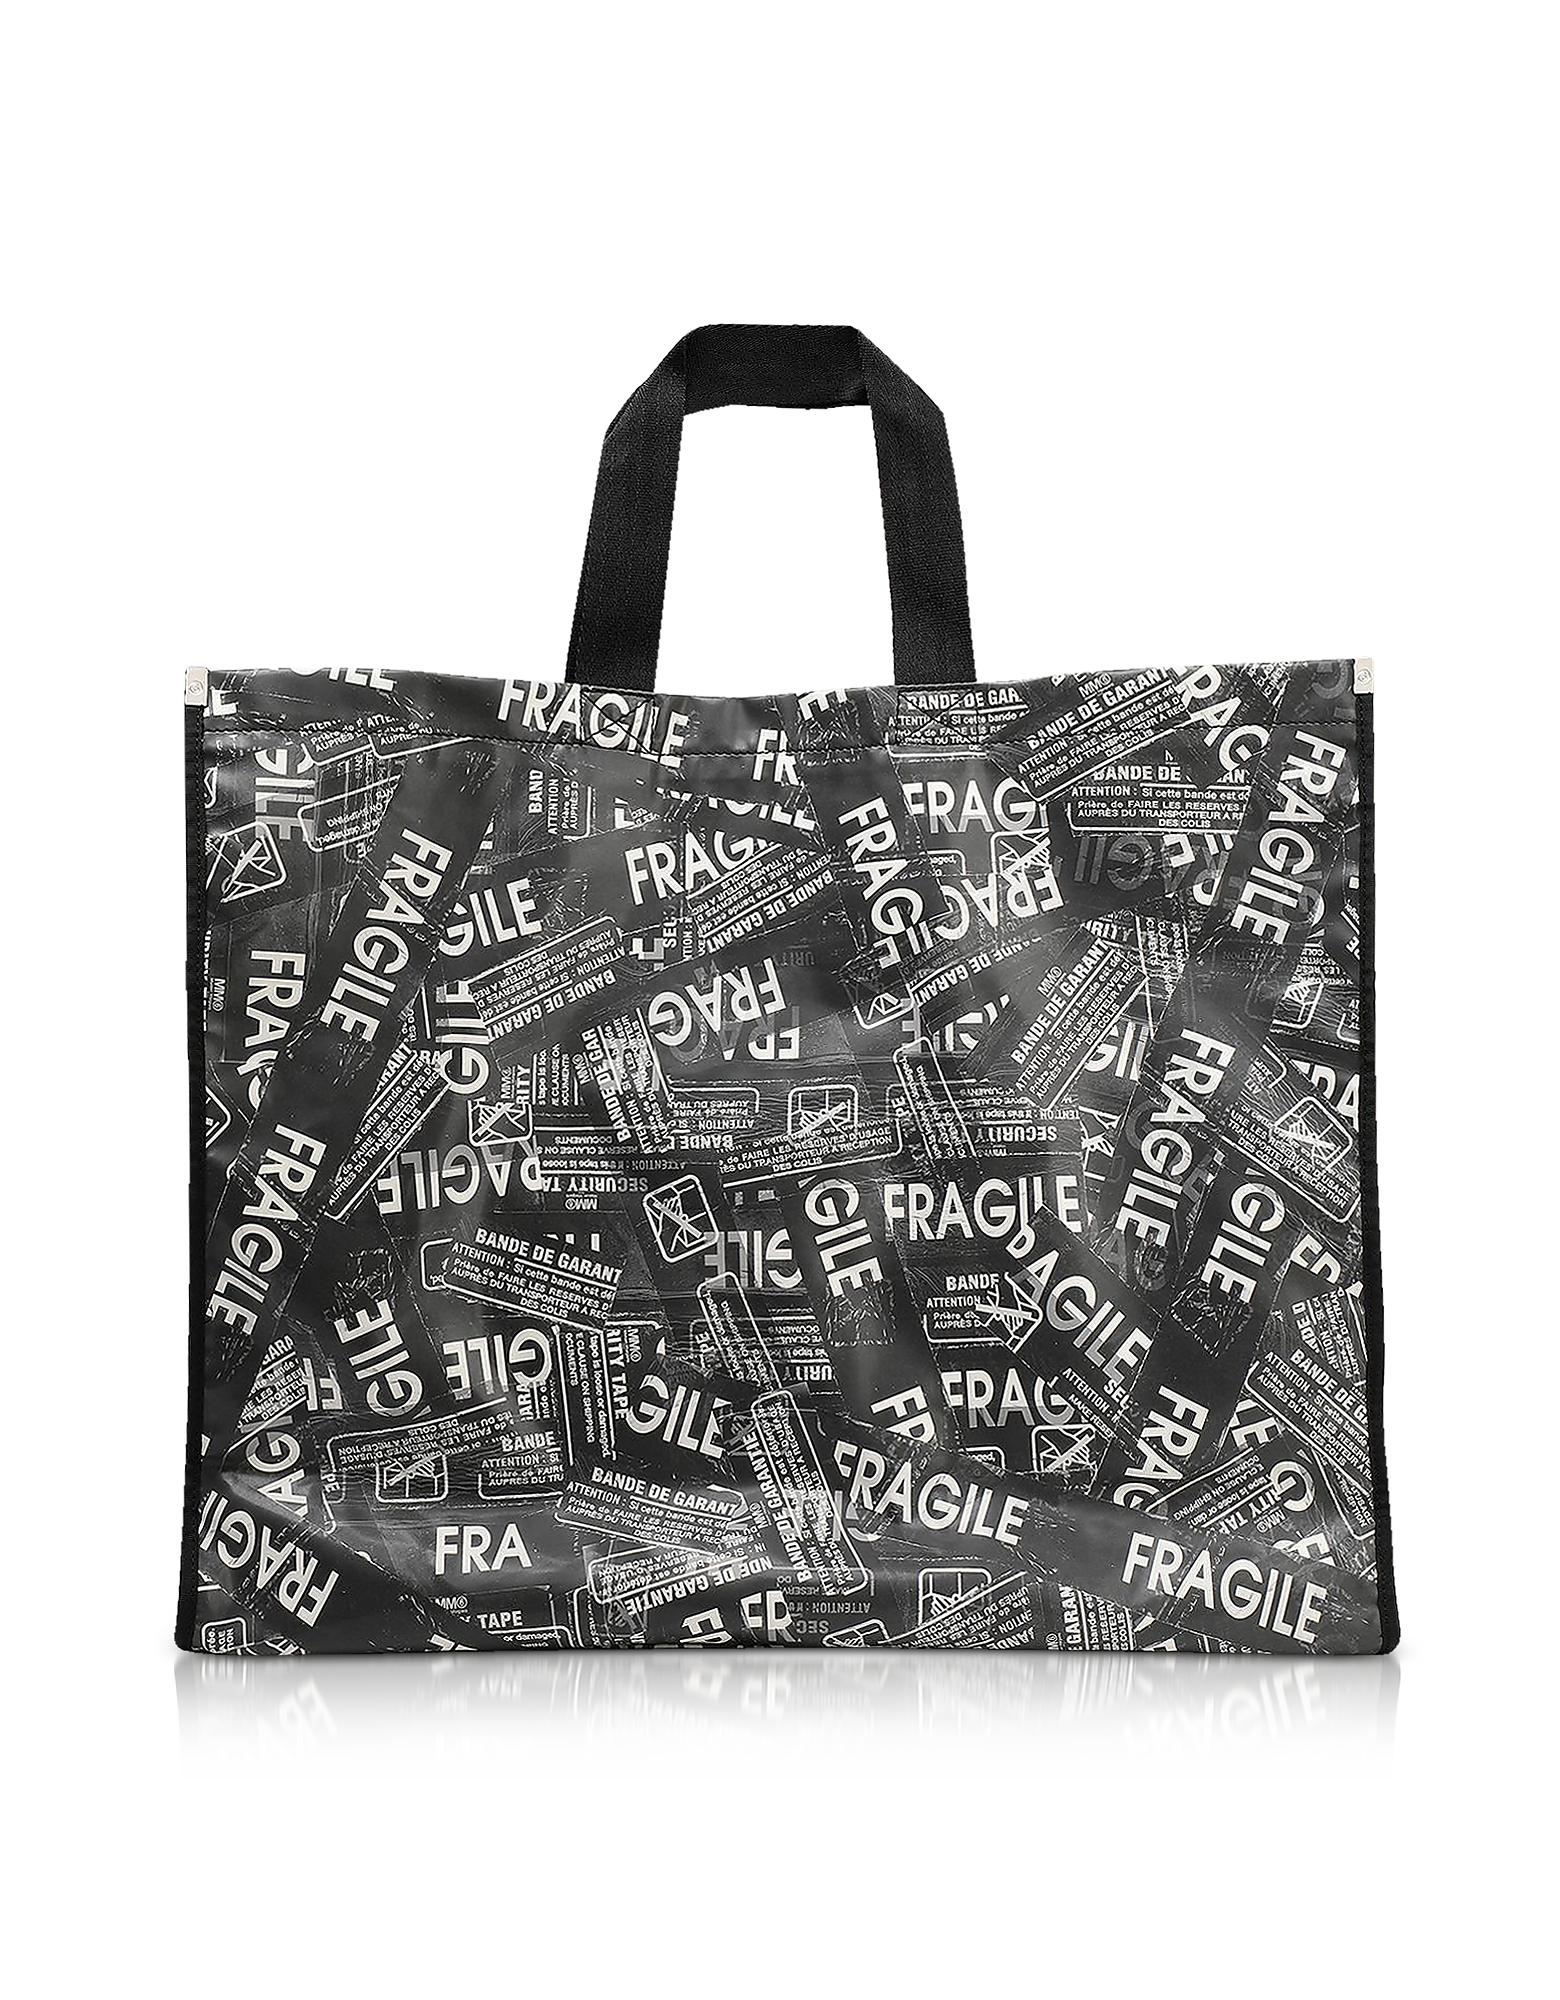 MM6 Maison Martin Margiela Designer Handbags, Fragile Printed Tote Bag